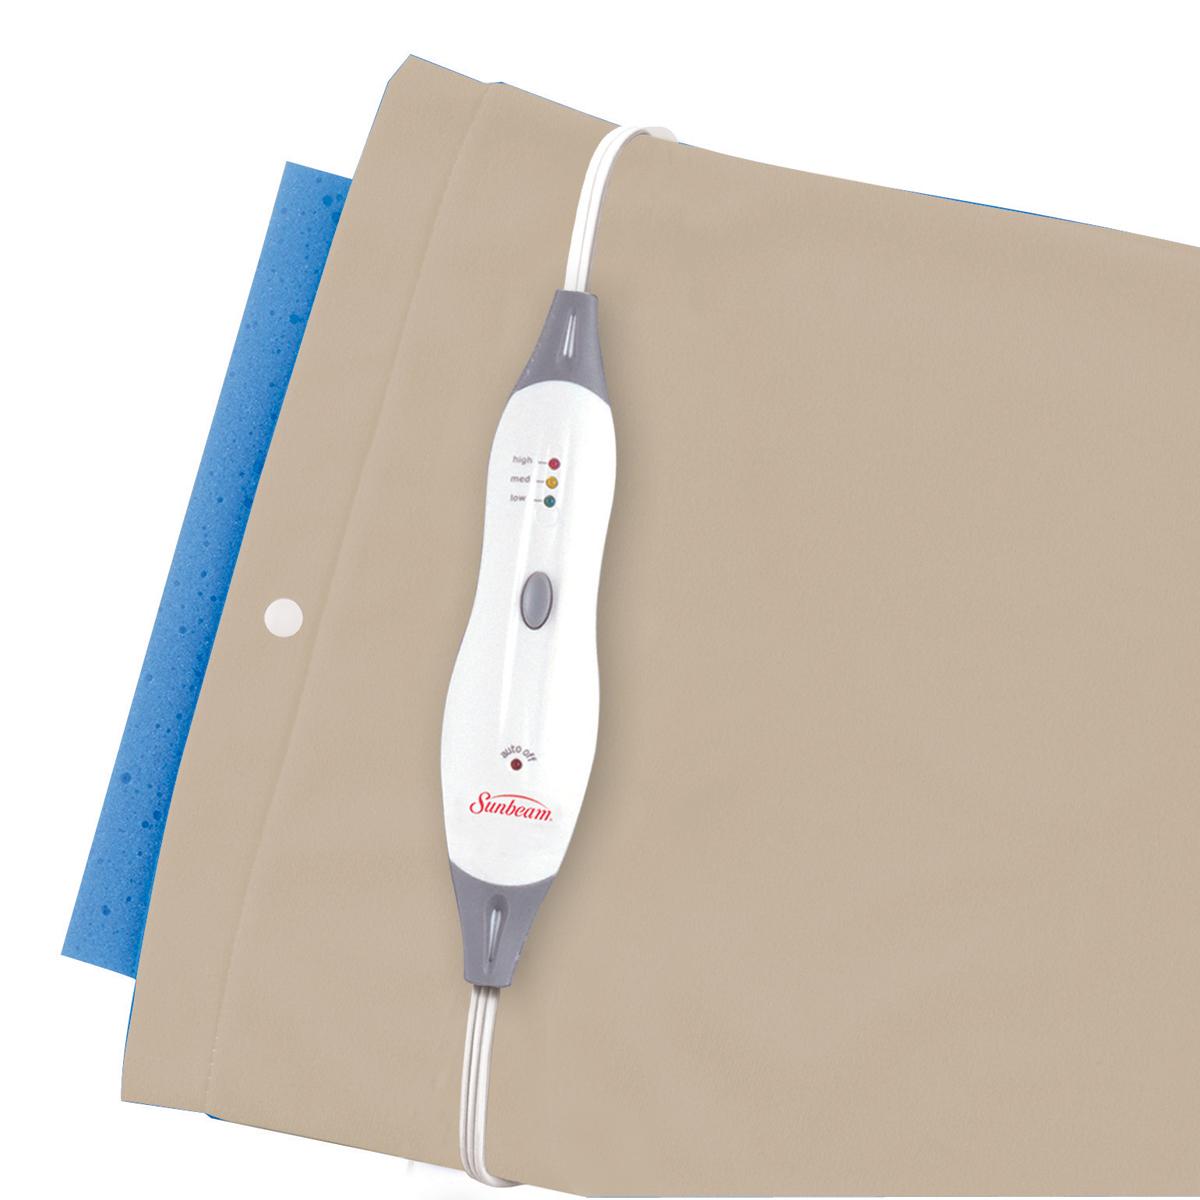 Sunbeam® Moist & Dry Heating Pad with Auto Off, Standard